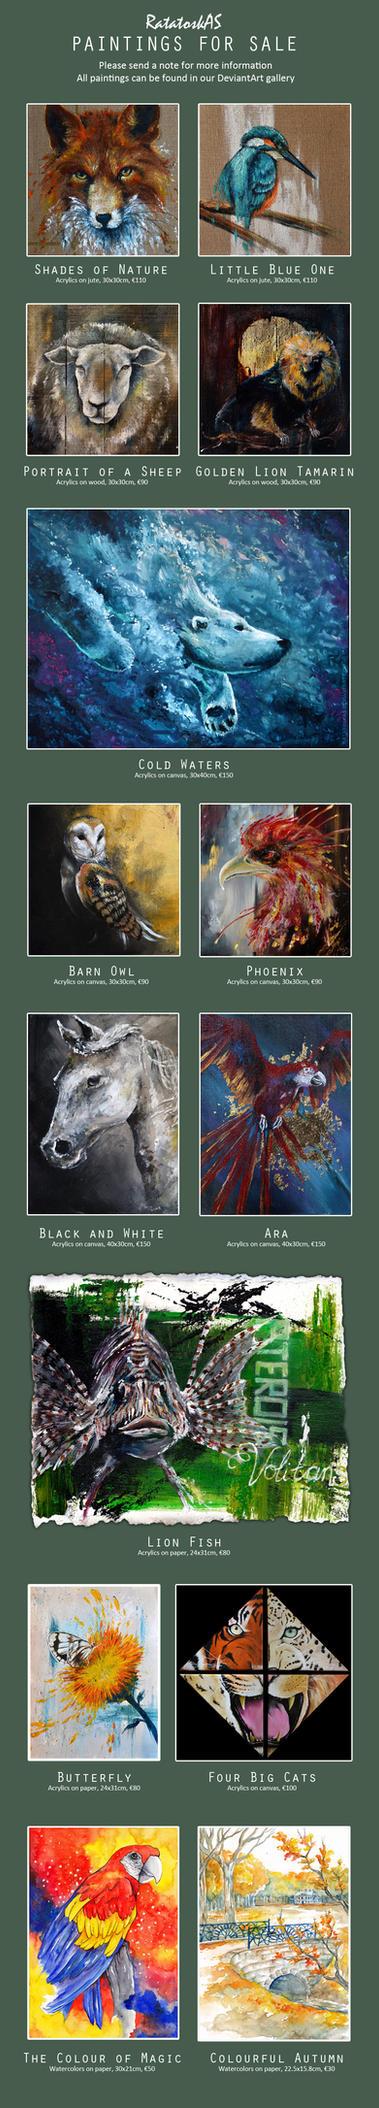 [For sale] Original paintings by RatatoskAS